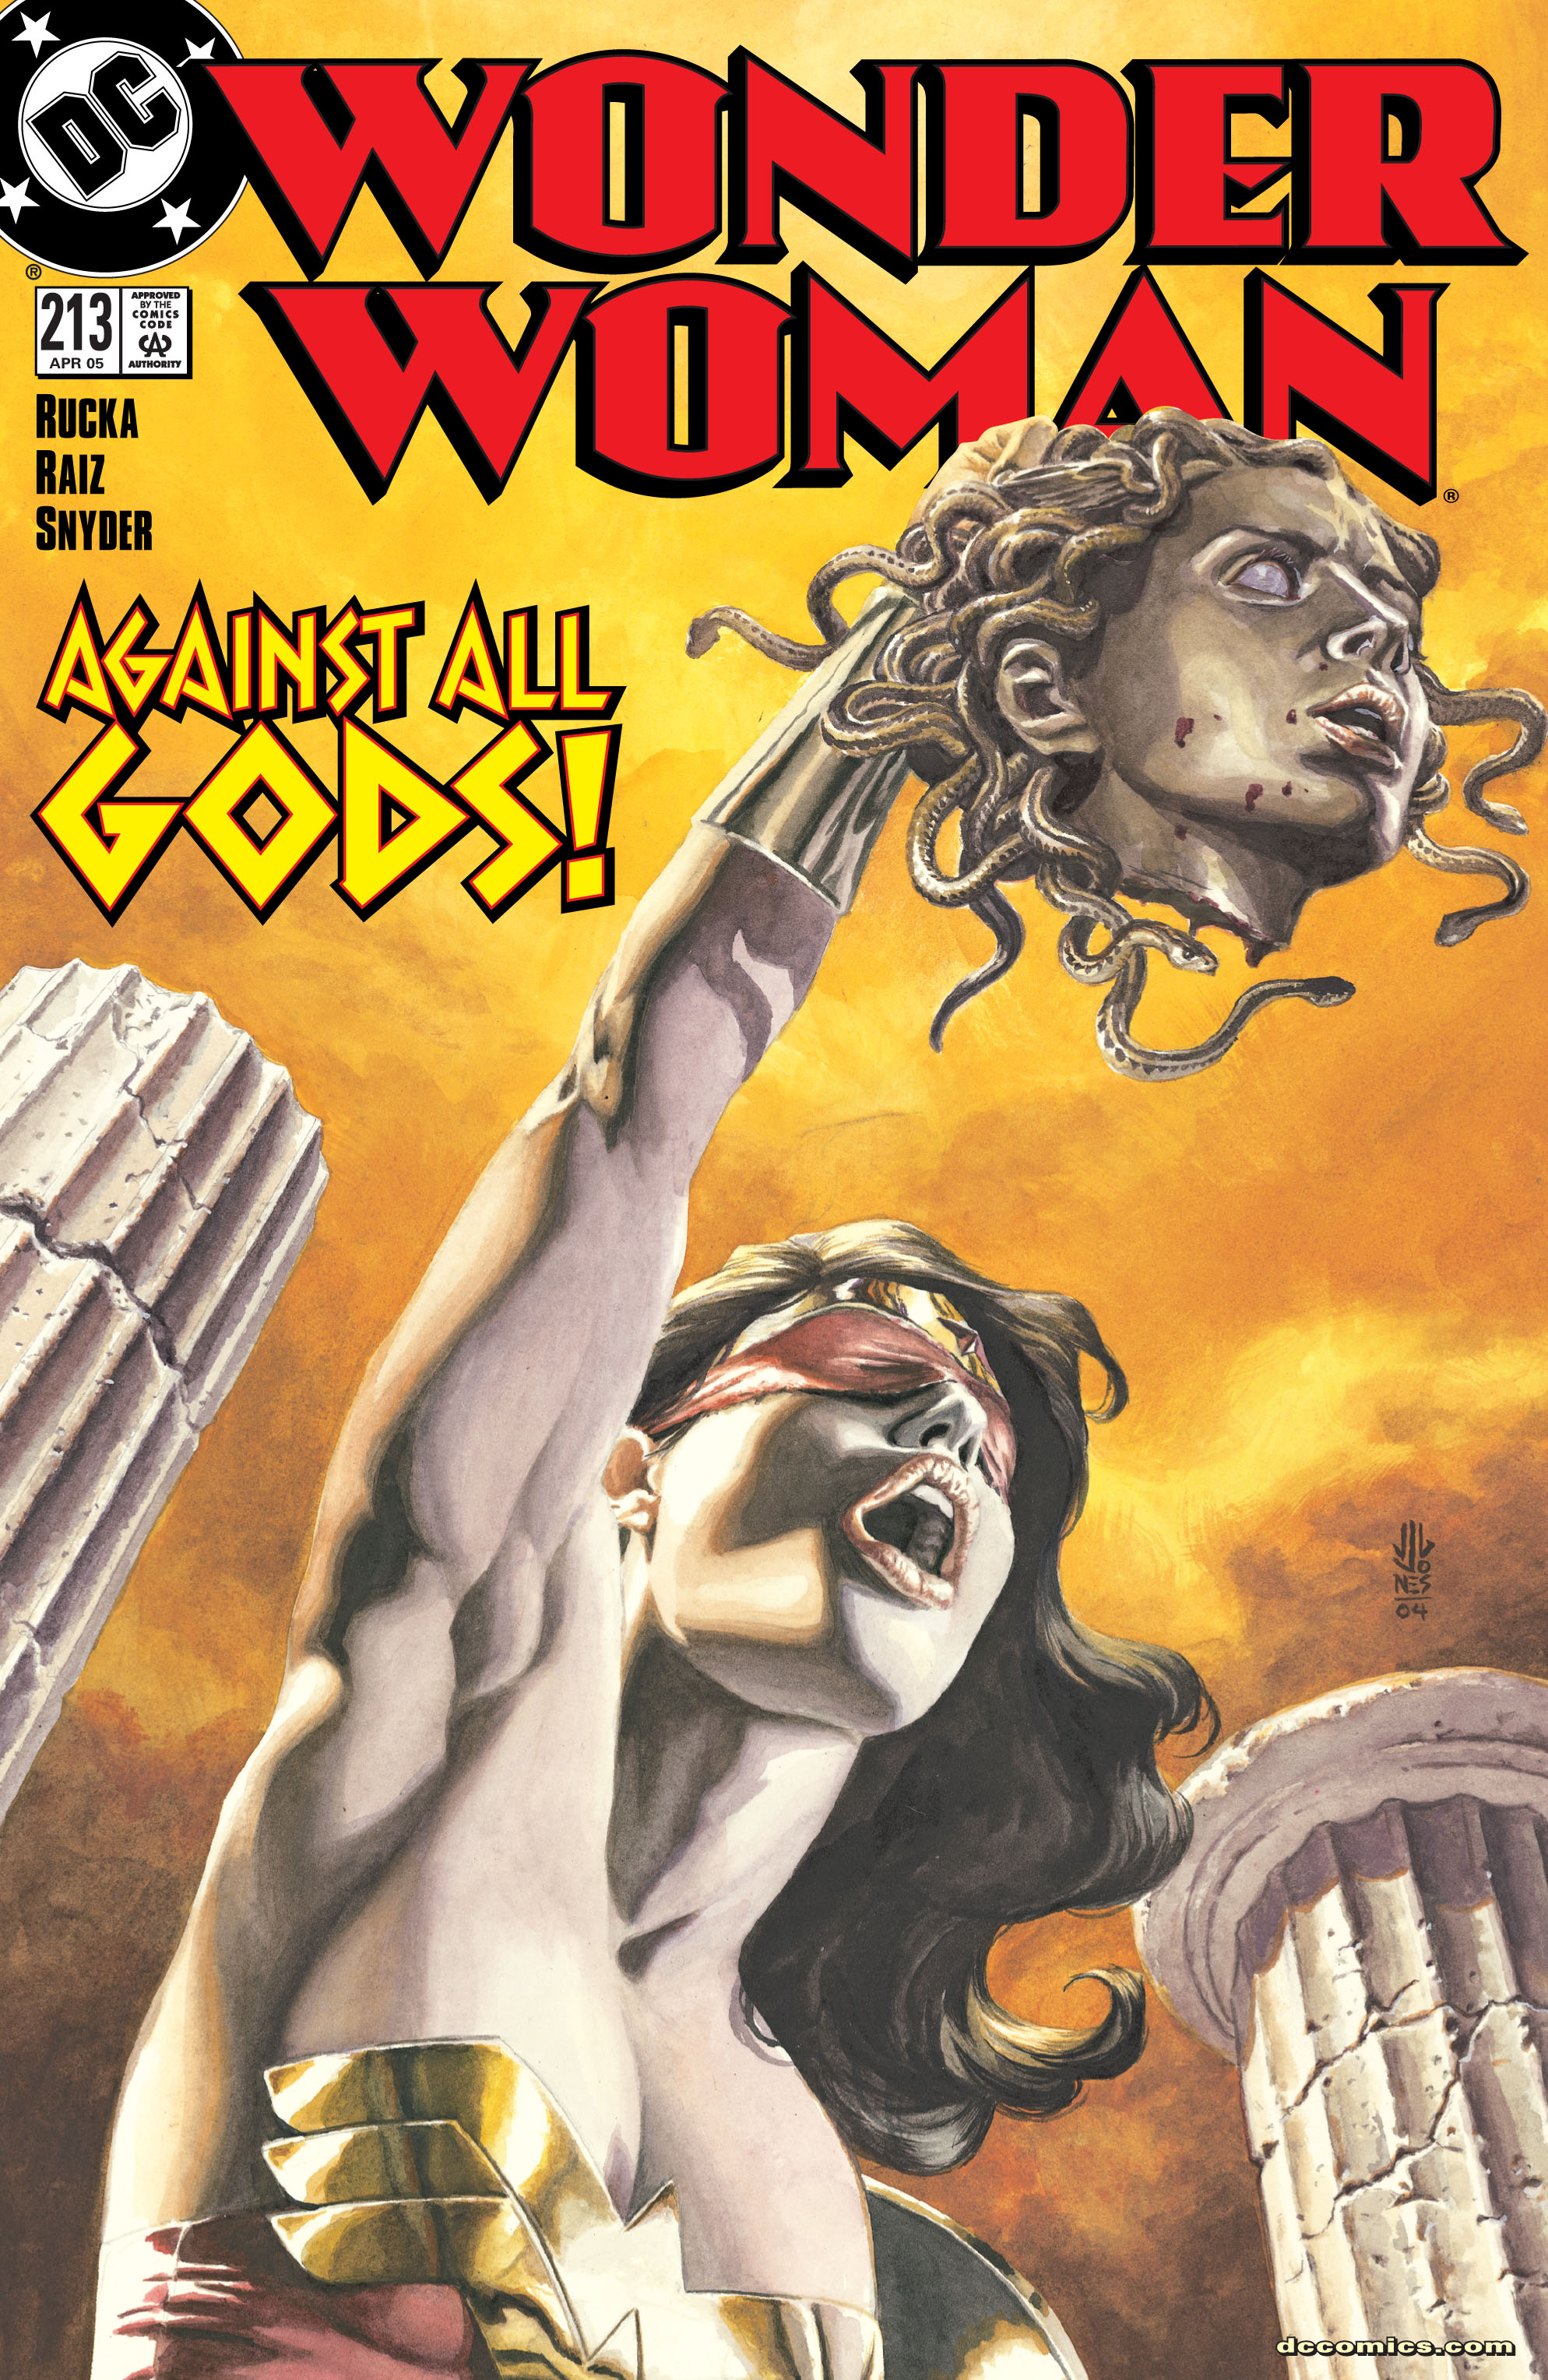 Read online Wonder Woman (1987) comic -  Issue #213 - 1